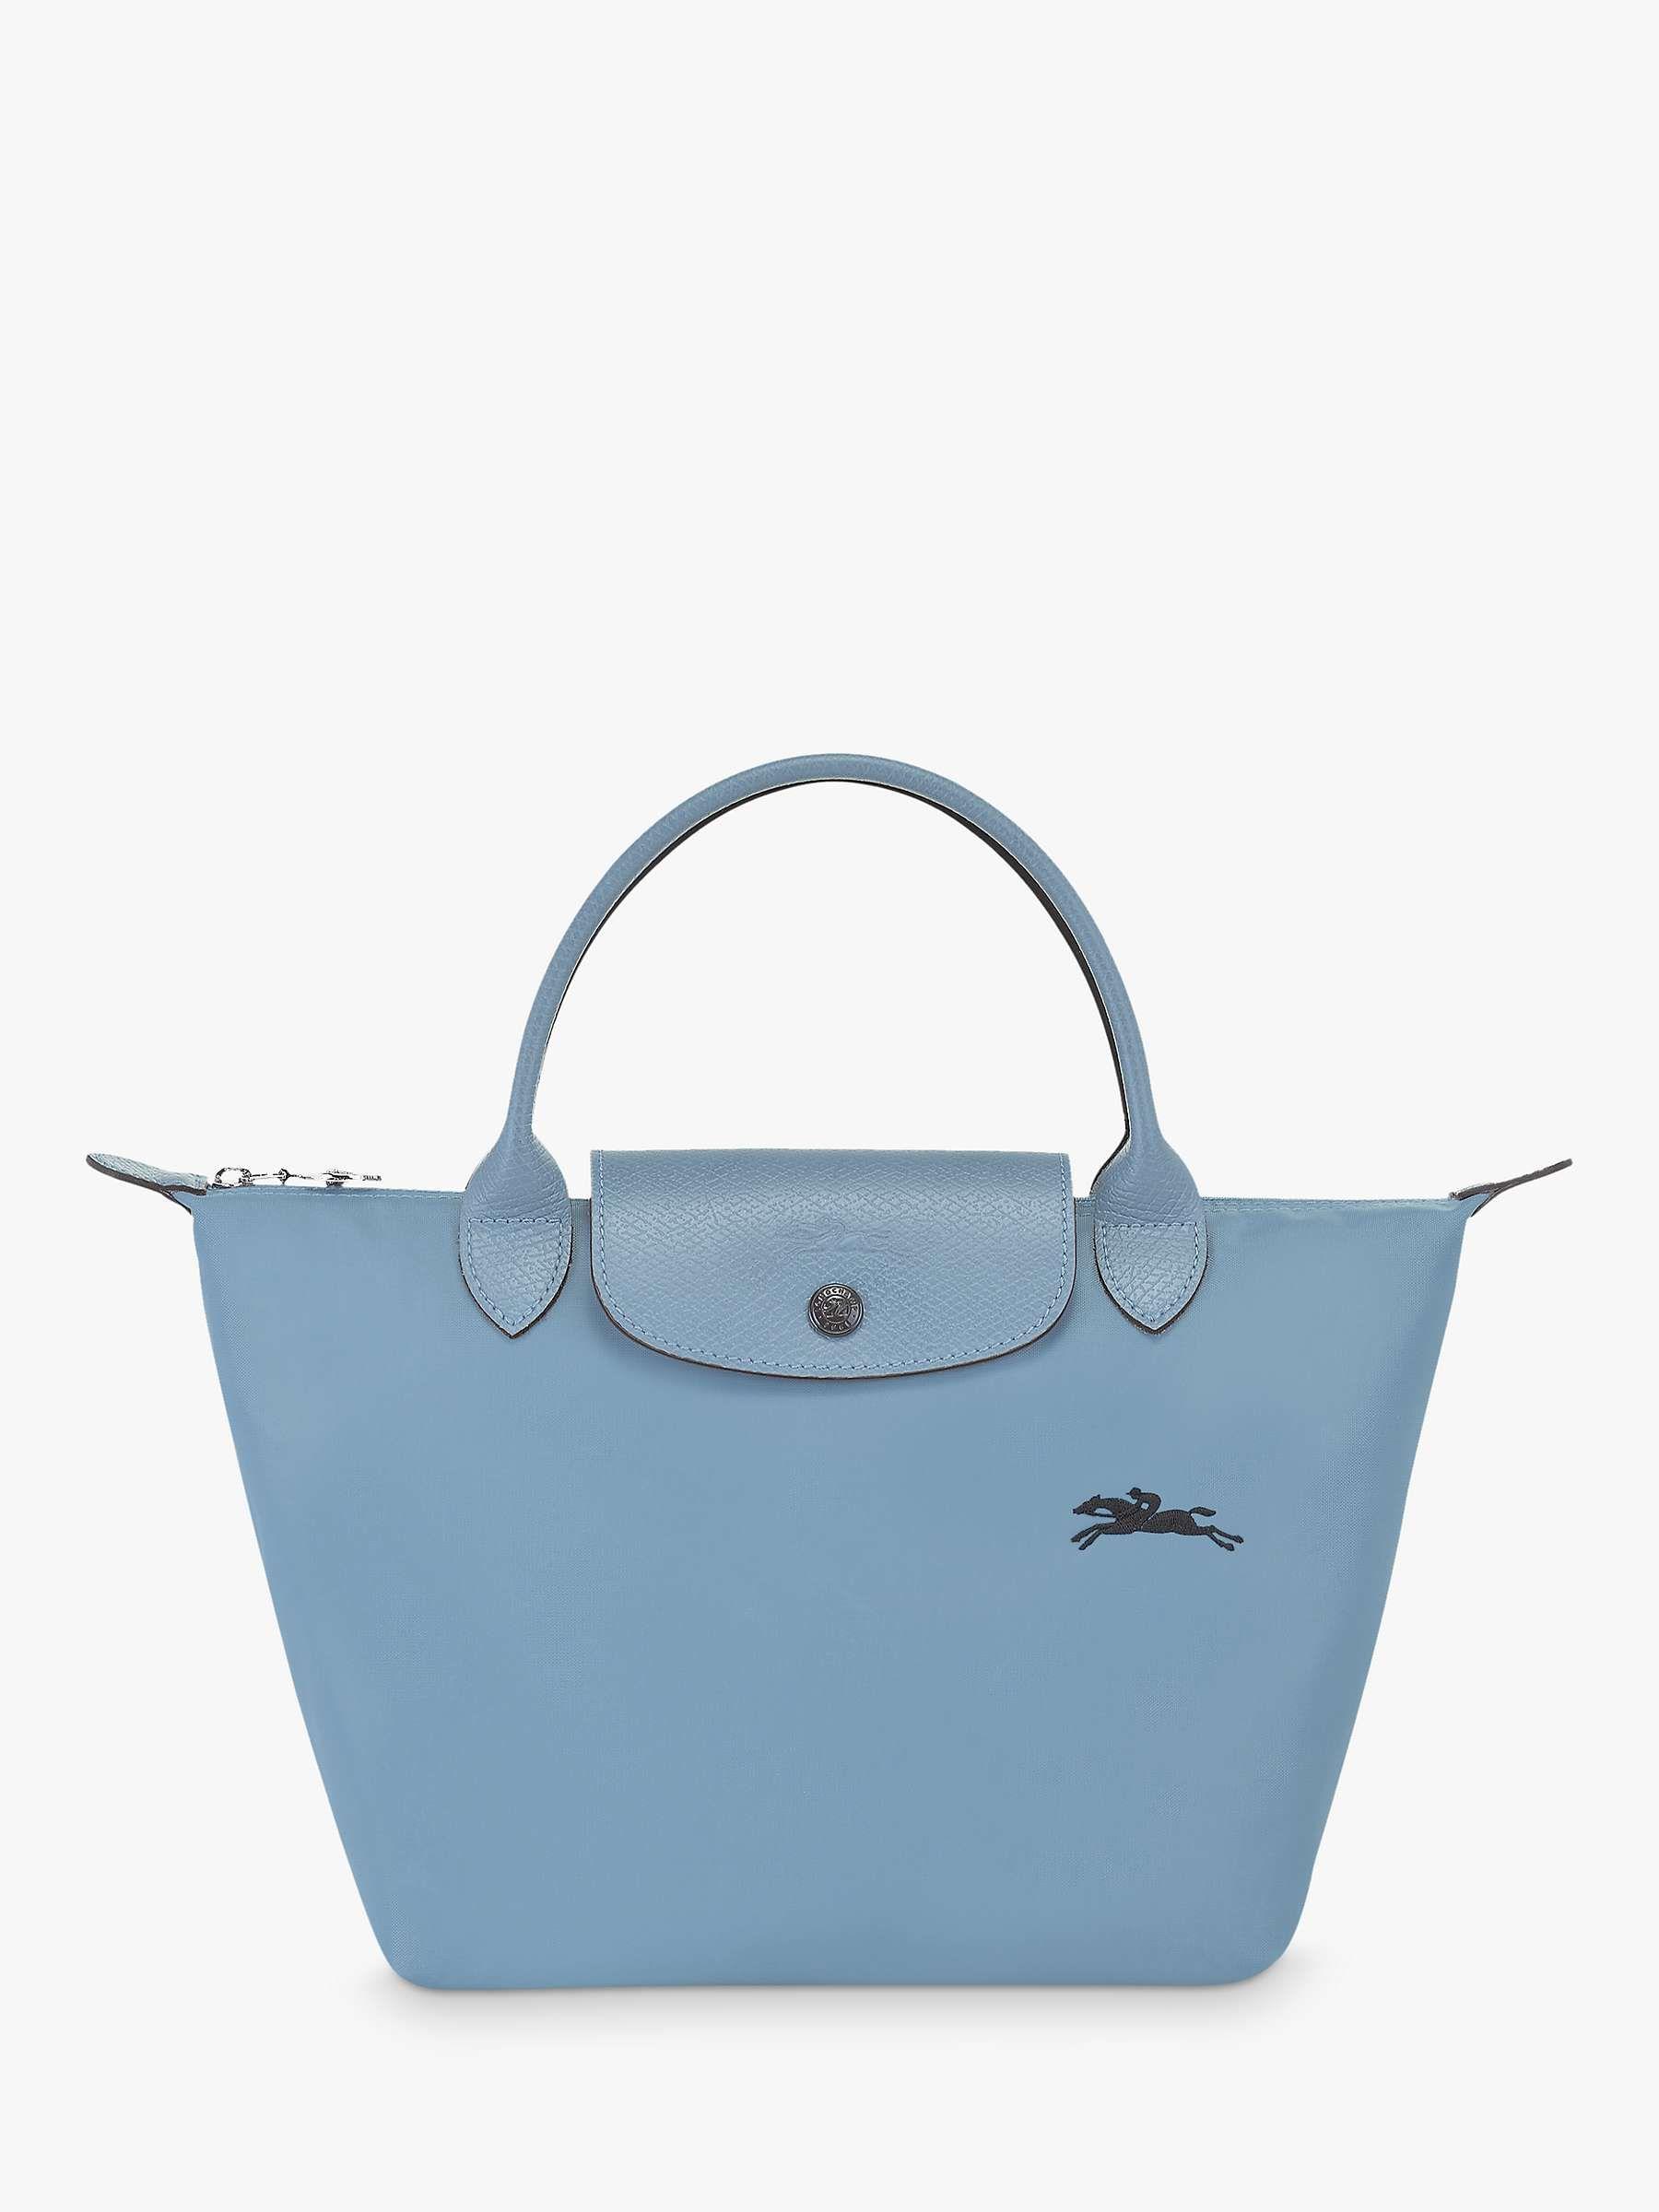 Black Friday Handbag Deals 2020: Coach, Gucci, Prada and more